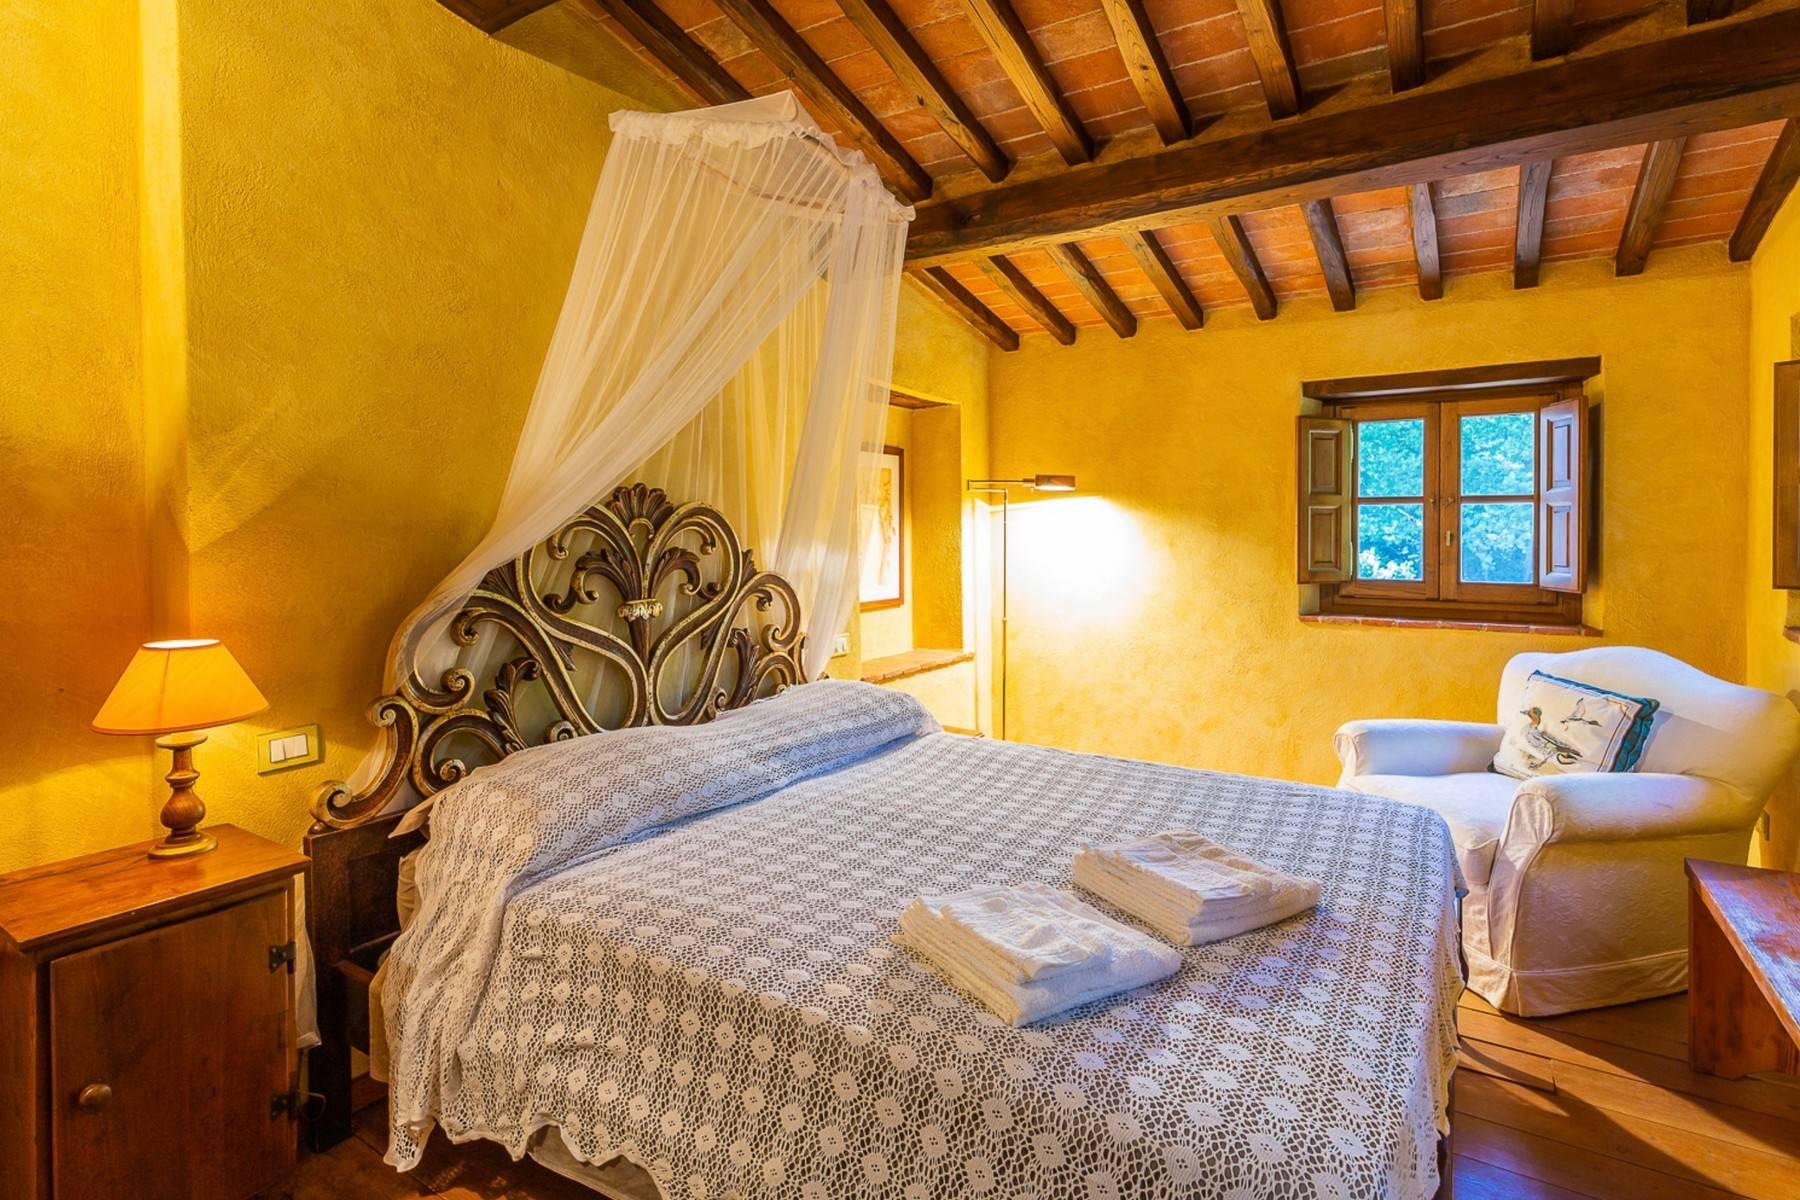 Villa in Vendita a Lucca: 5 locali, 1130 mq - Foto 10